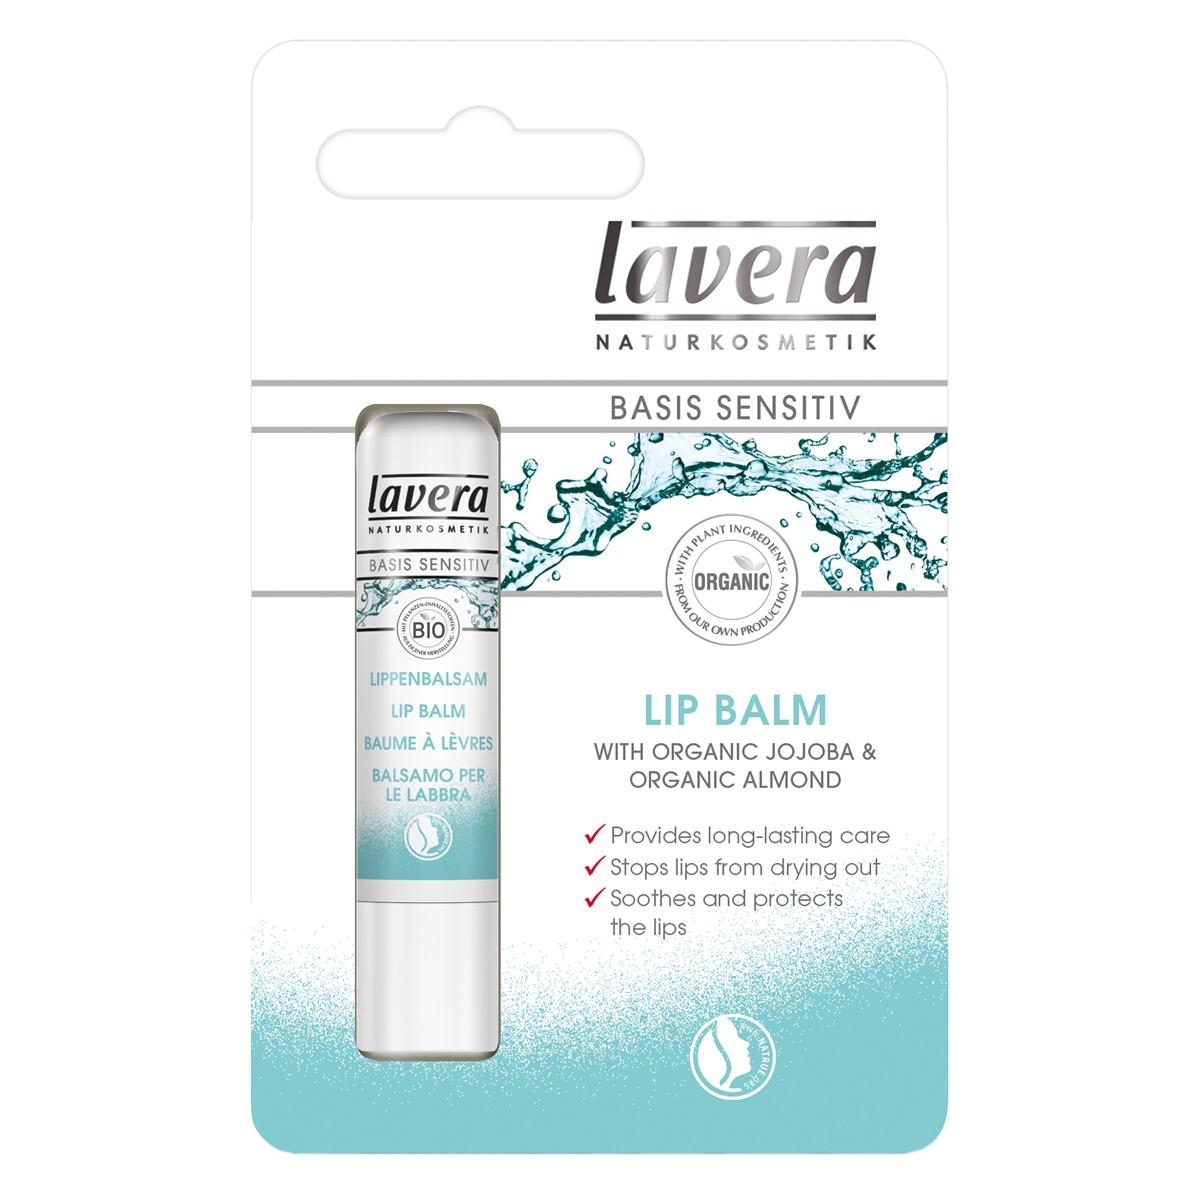 Lavera Basis Sensitiv  Organic Lip Balm